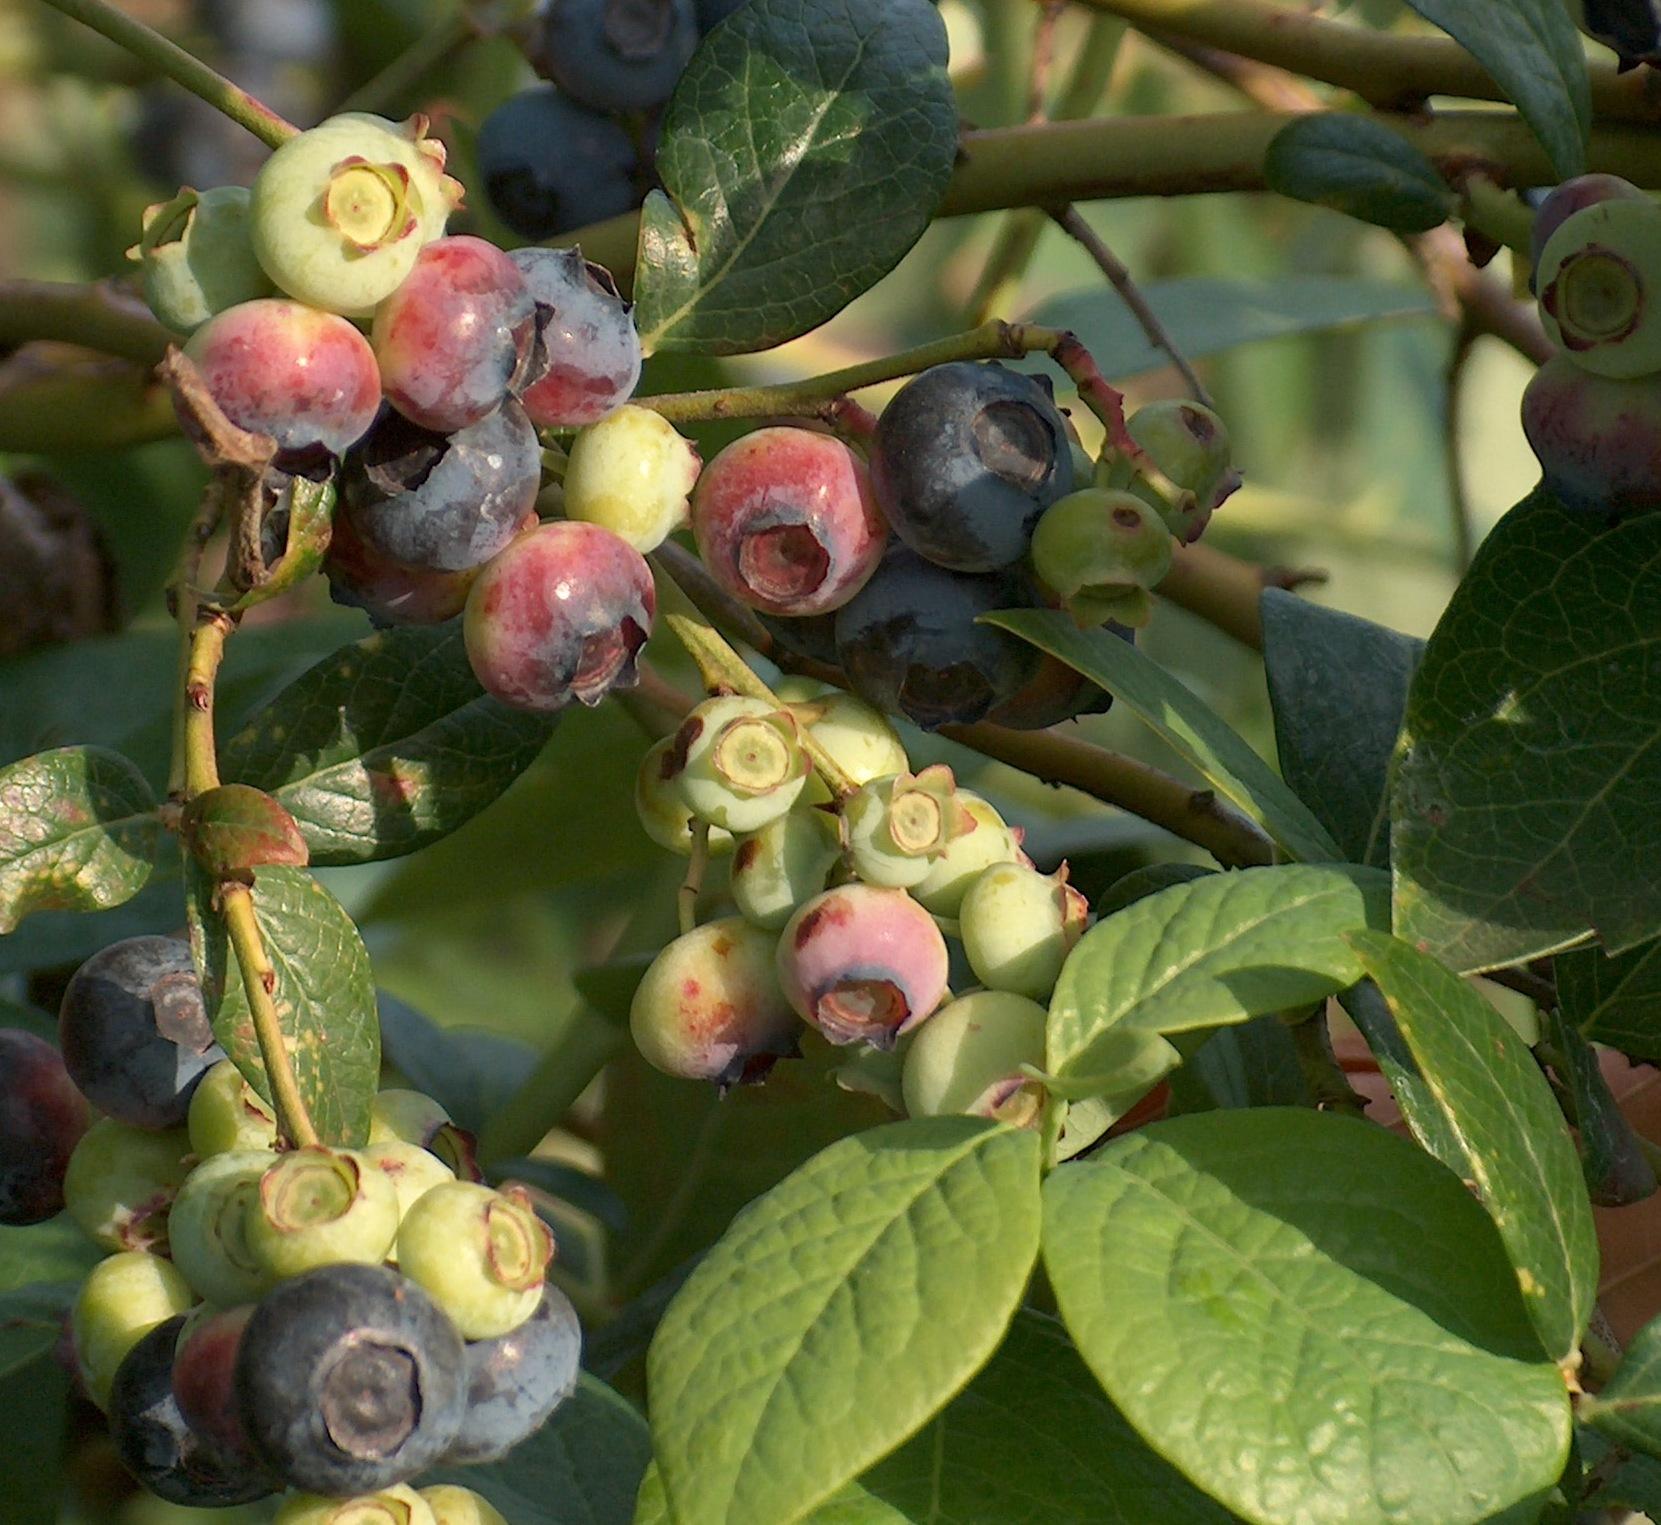 Blueberries are Burstin' Forth